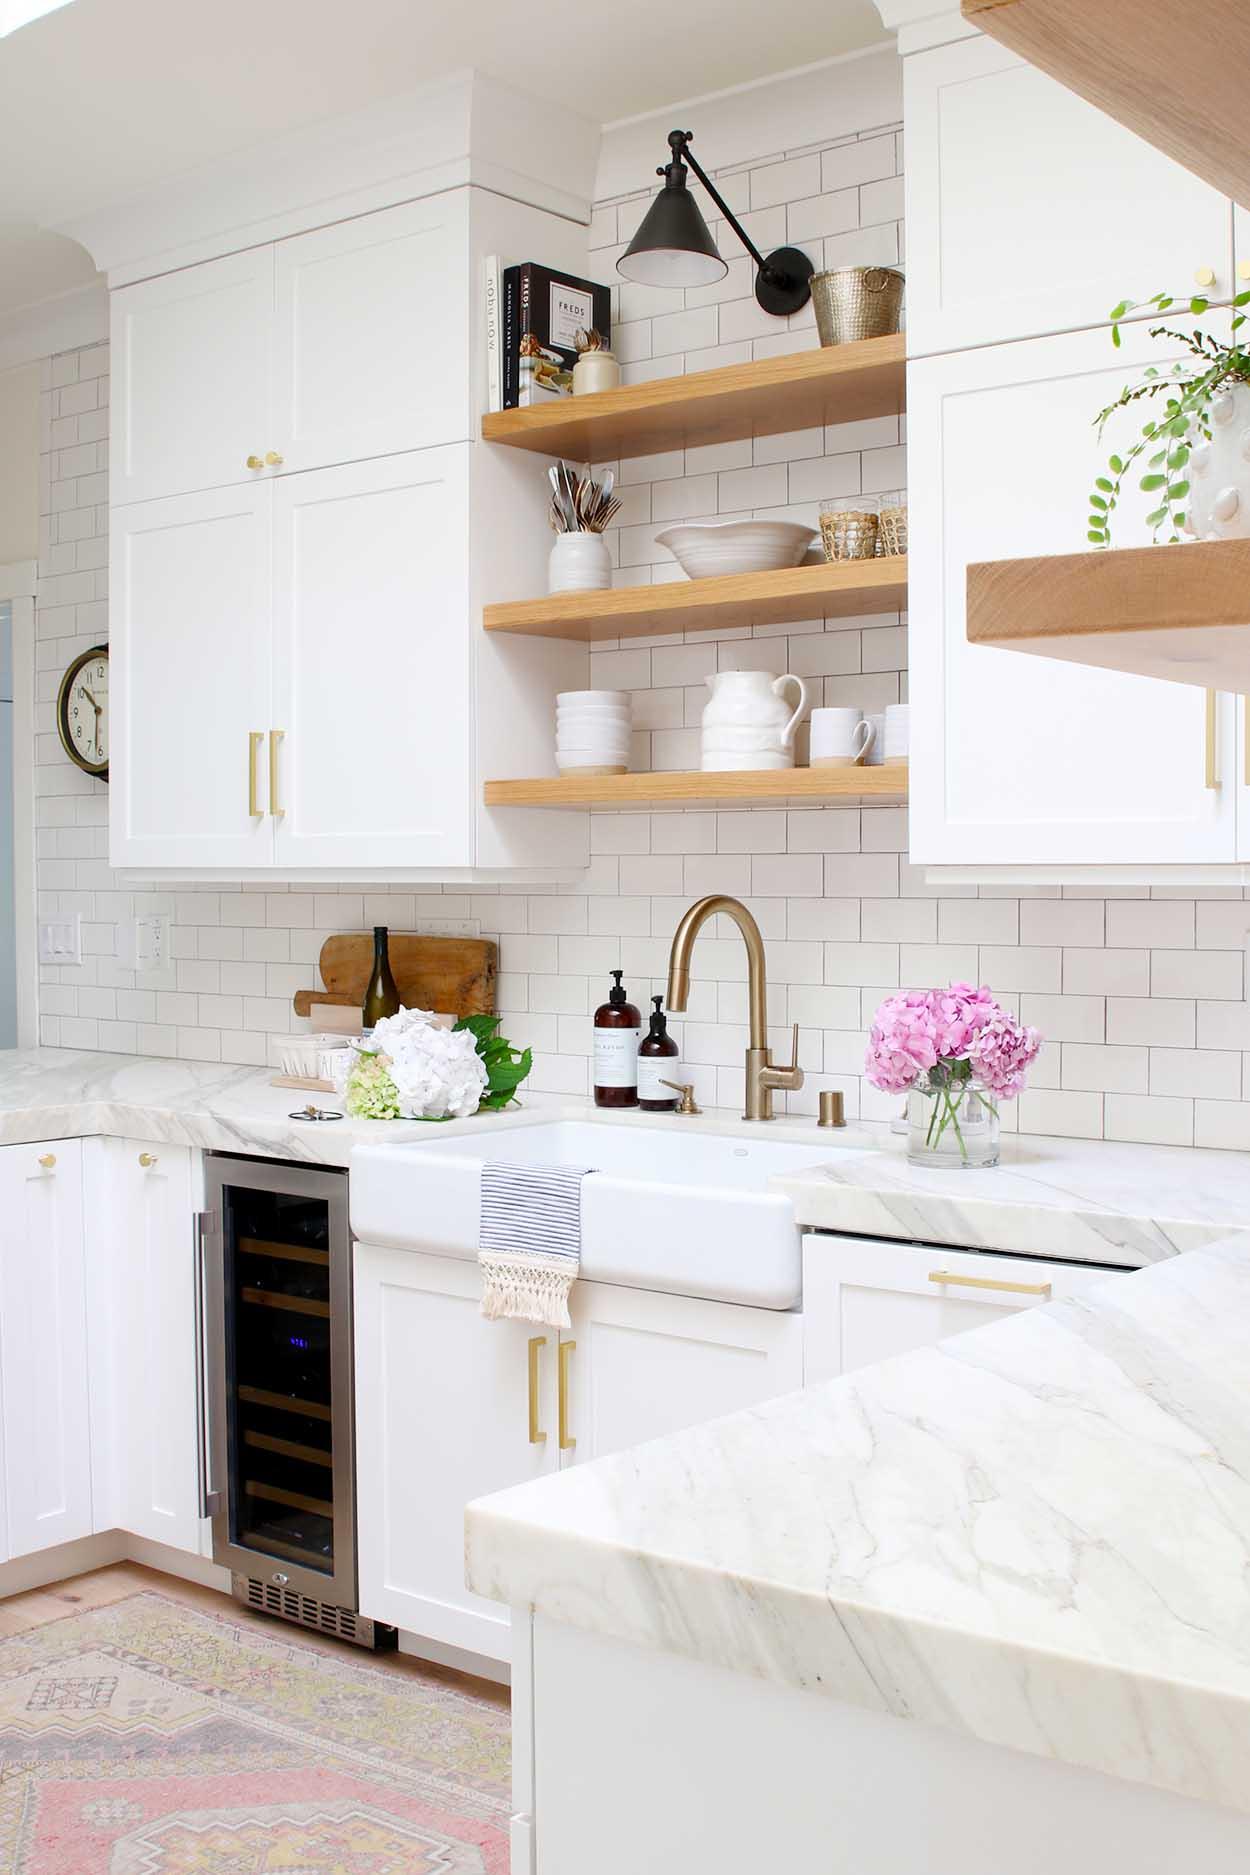 Modern Farmhouse Kitchen Reveal - Modern Glam on Kitchen Redesign Ideas  id=21337